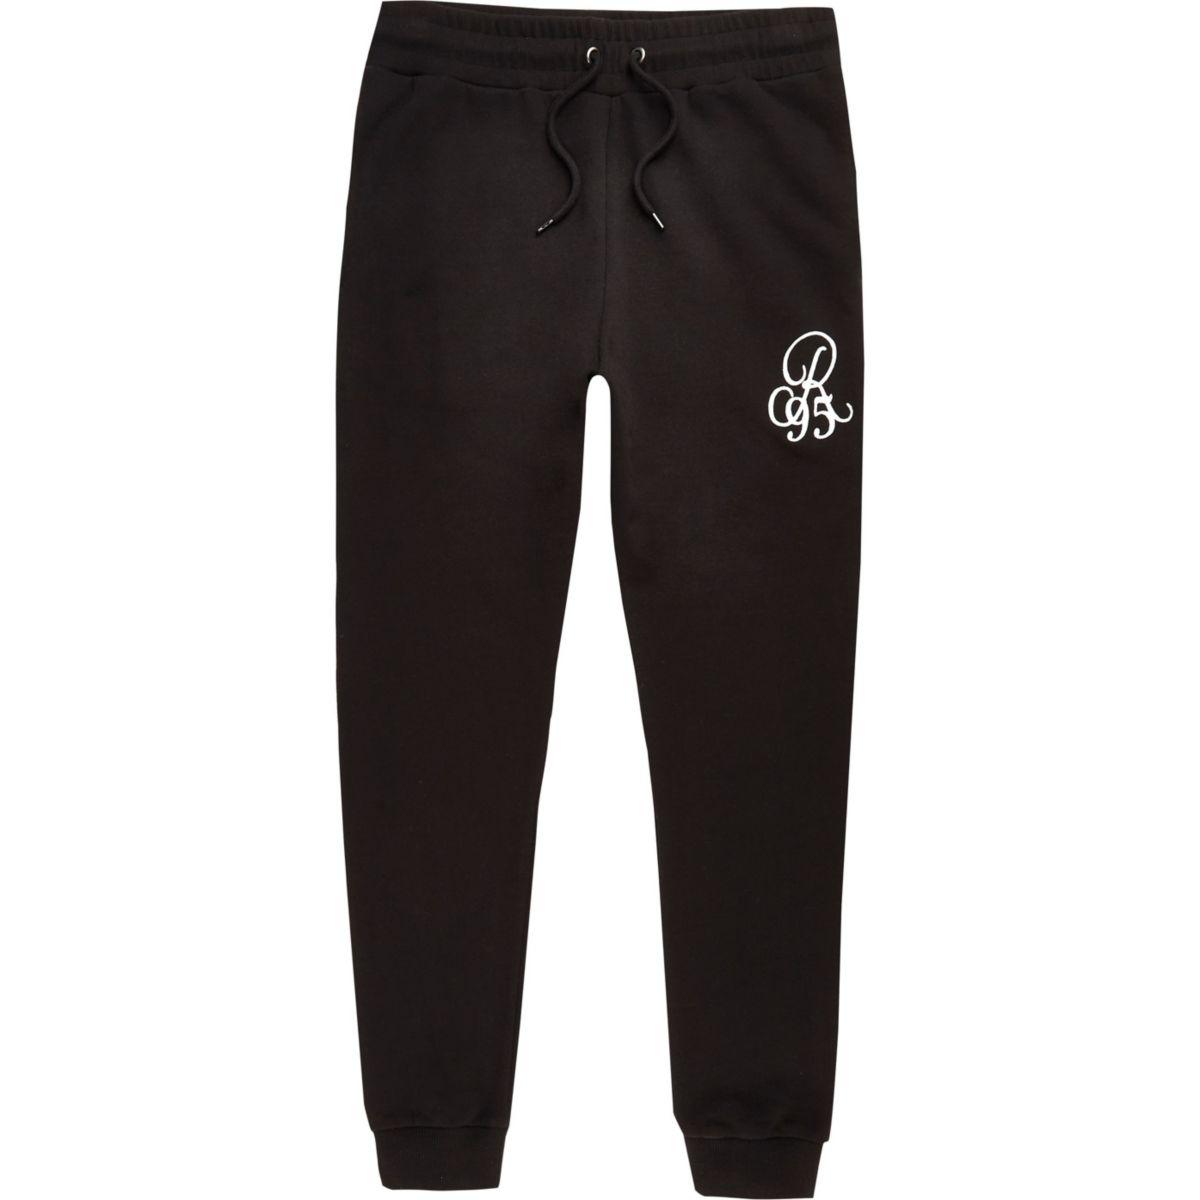 Big and Tall black jogging bottoms